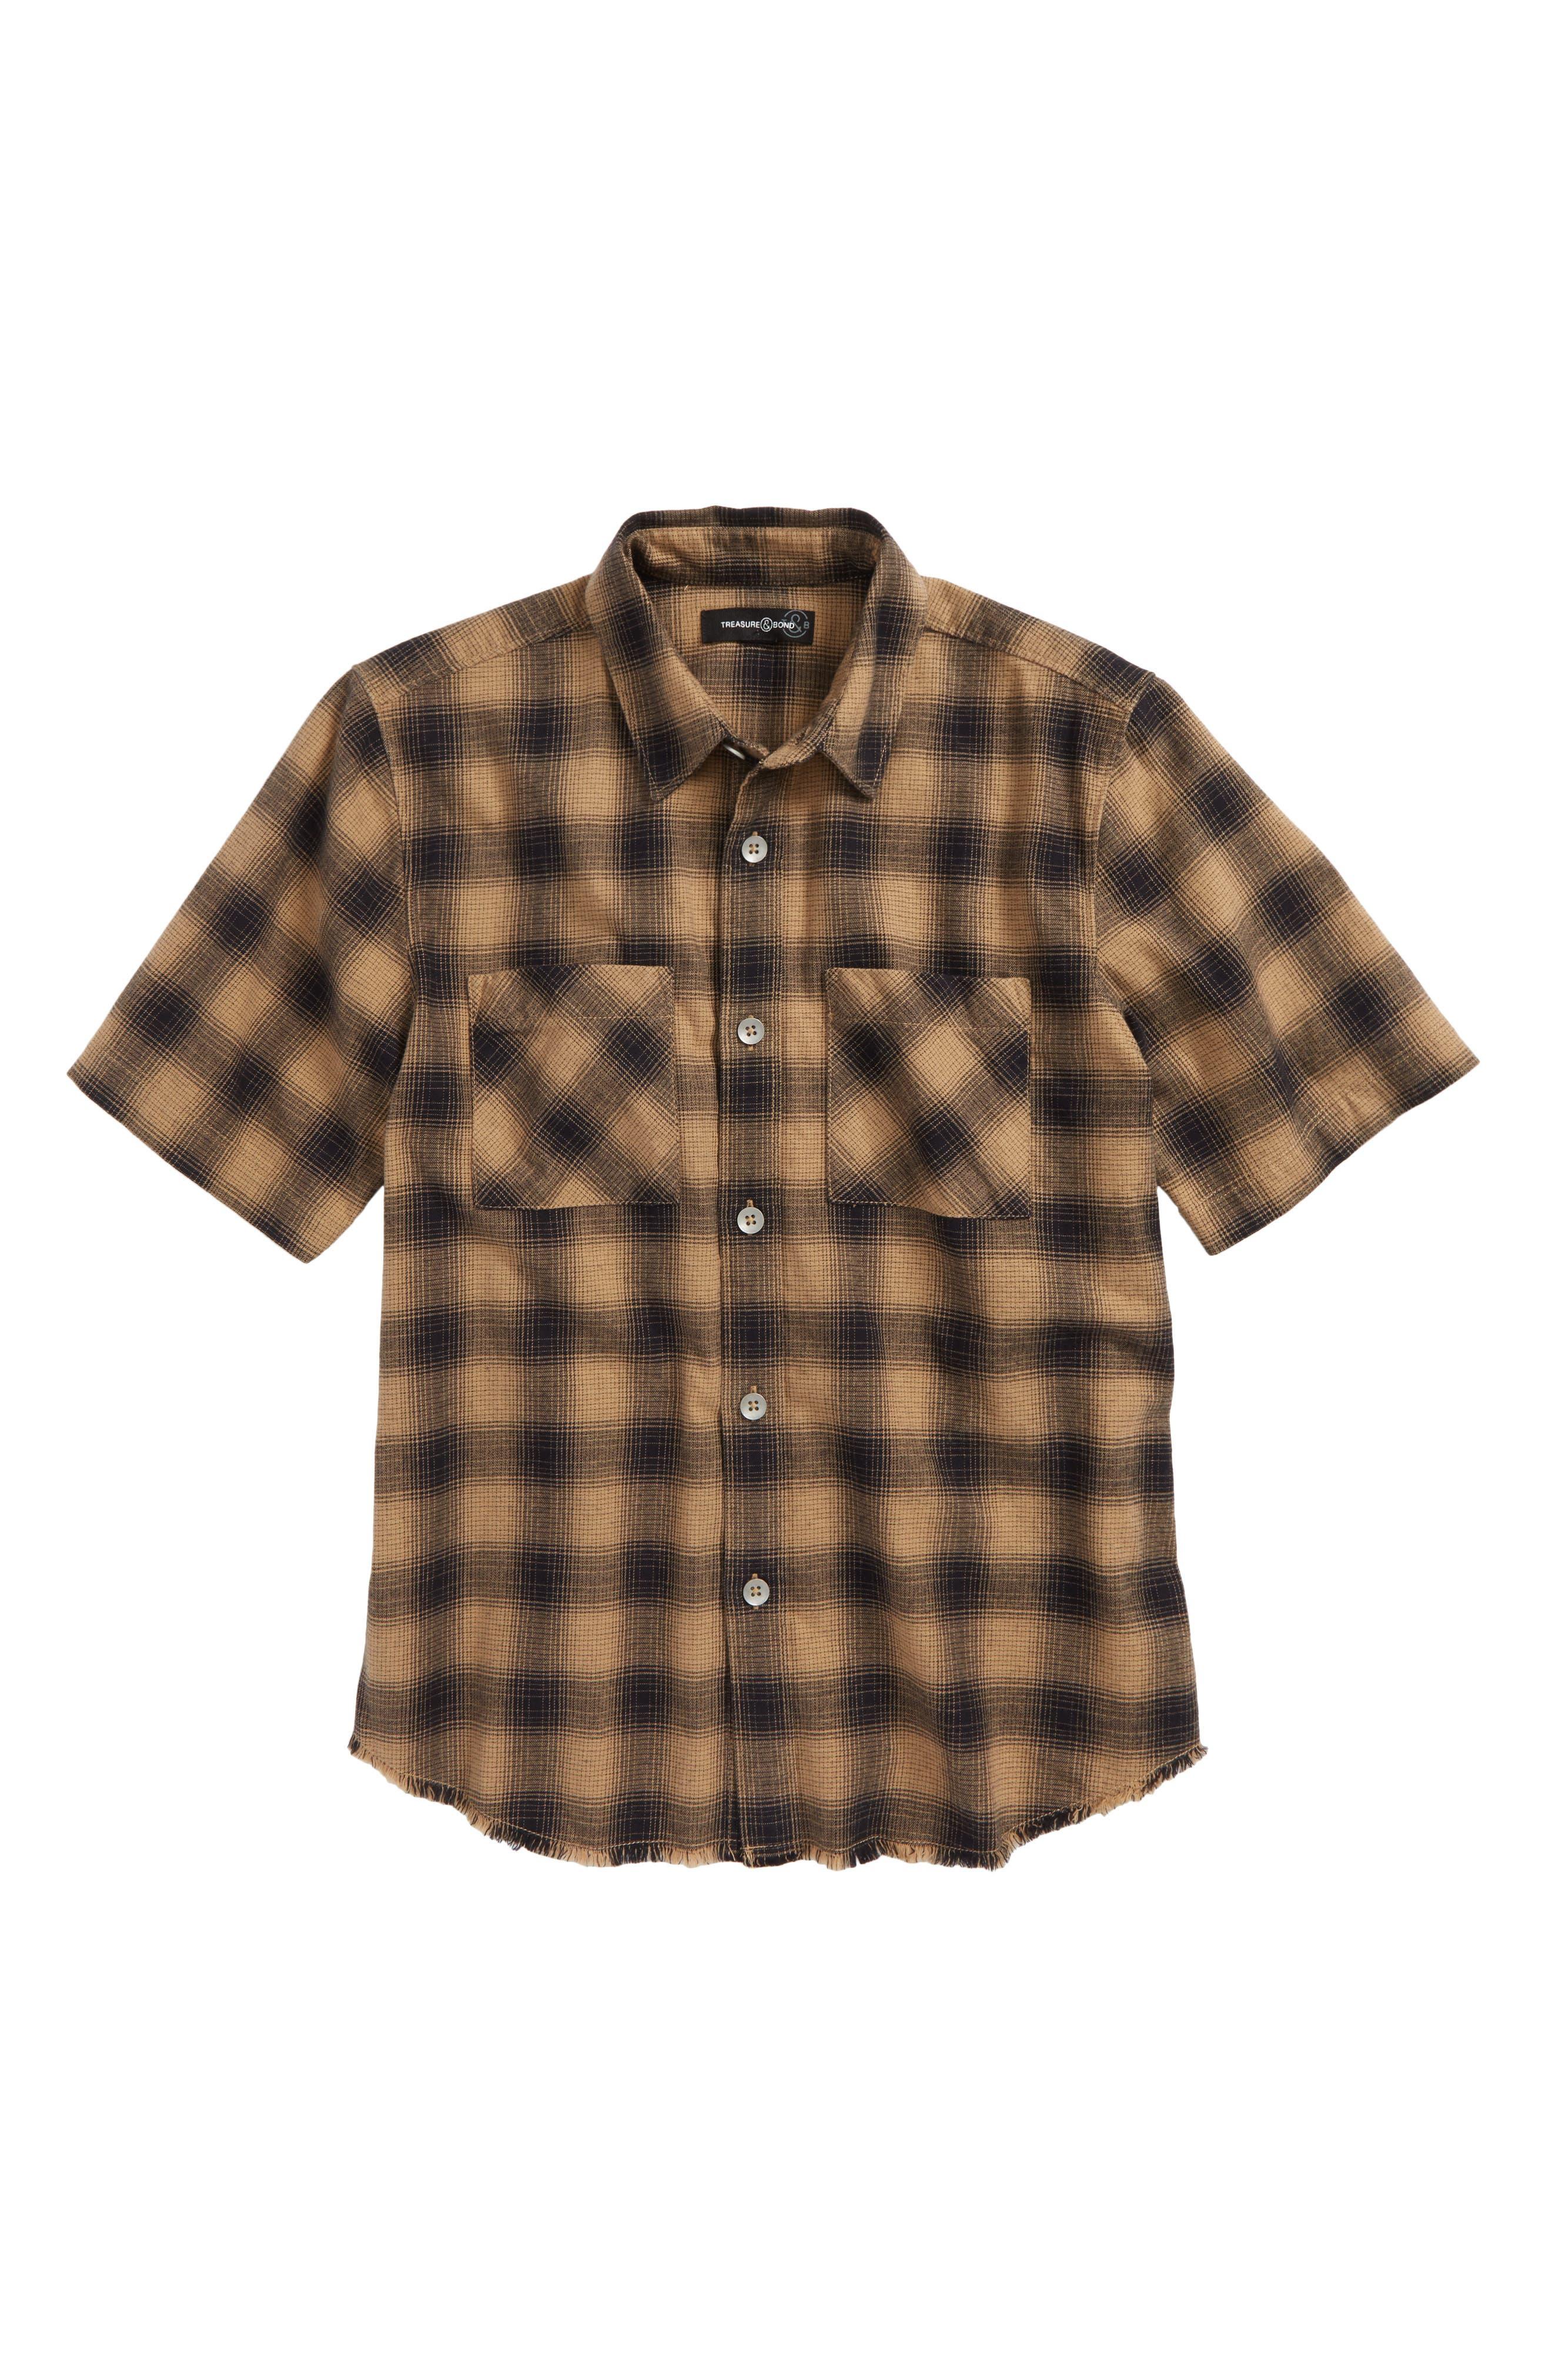 Distressed Plaid Flannel Shirt,                             Main thumbnail 1, color,                             210